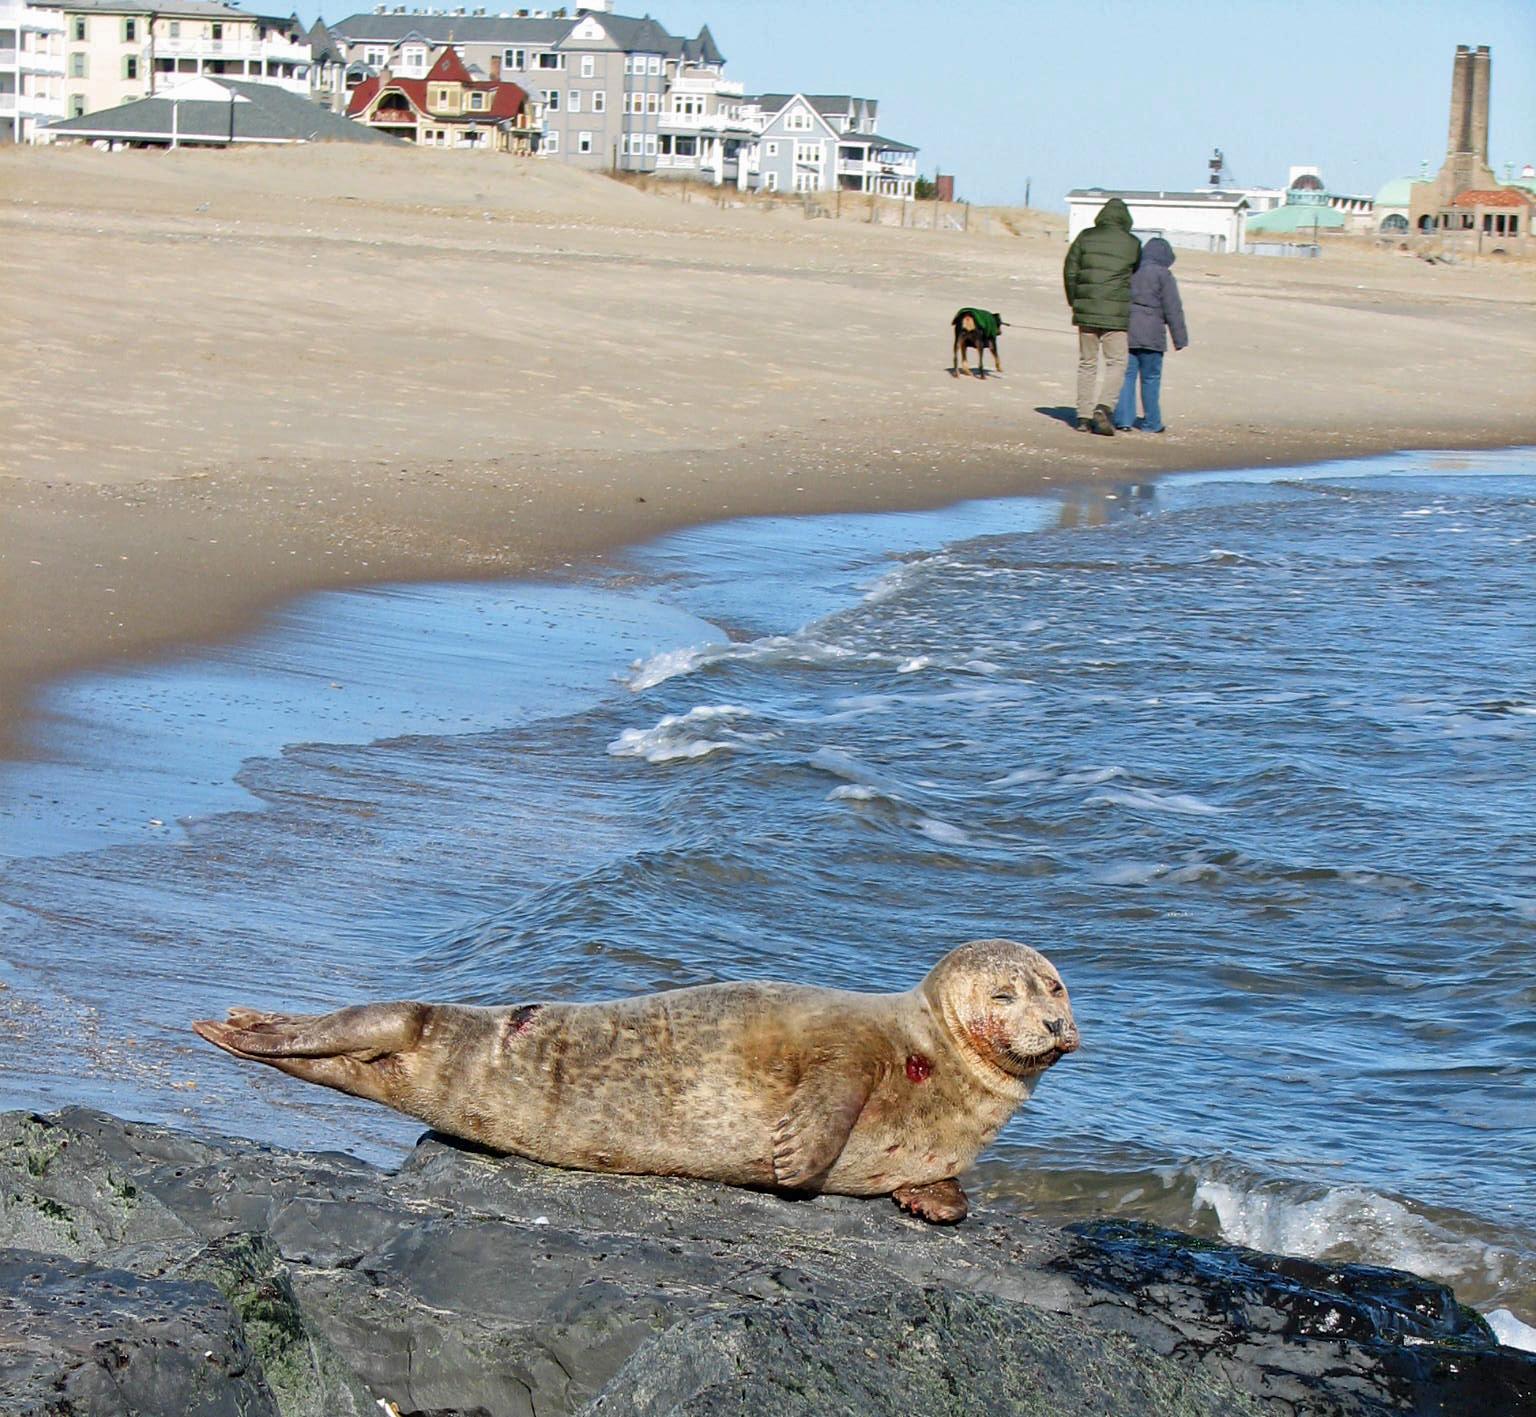 Harbor Seals in New Jersey